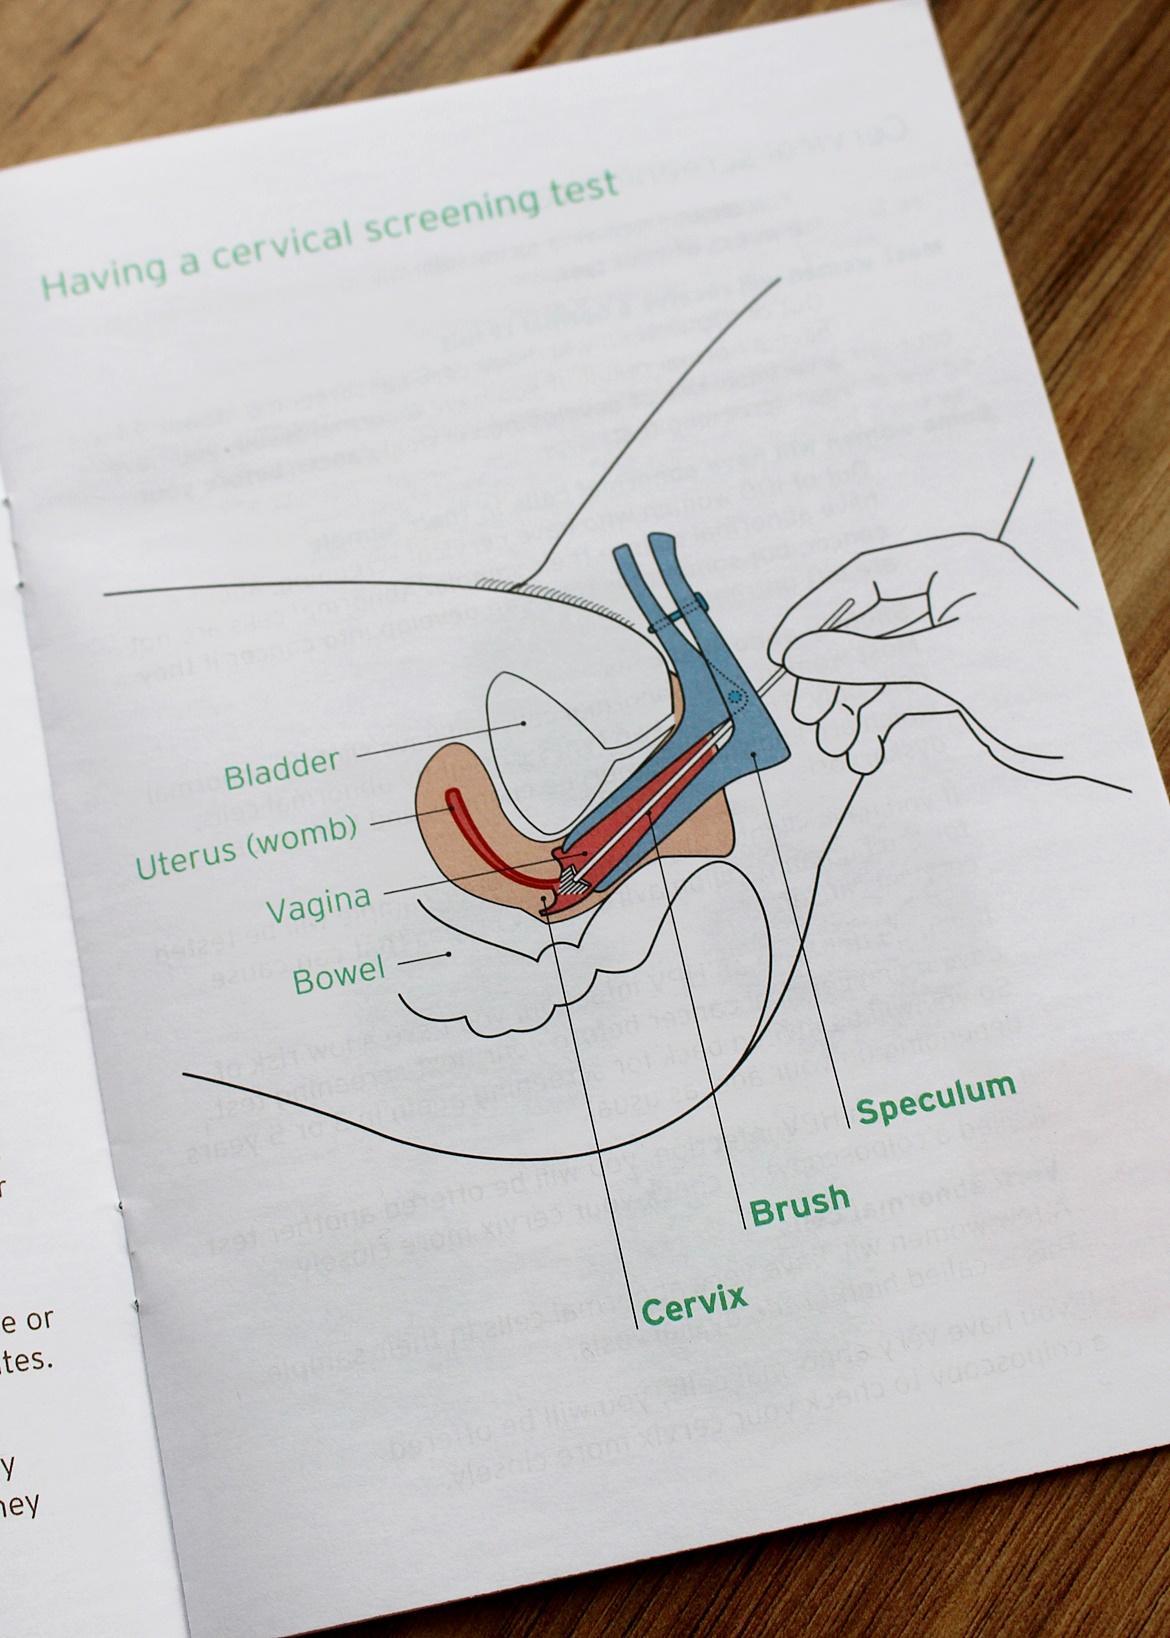 Cervical Smear Test Cytologia W Anglii Mama W Uk Blog O życiu W Uk